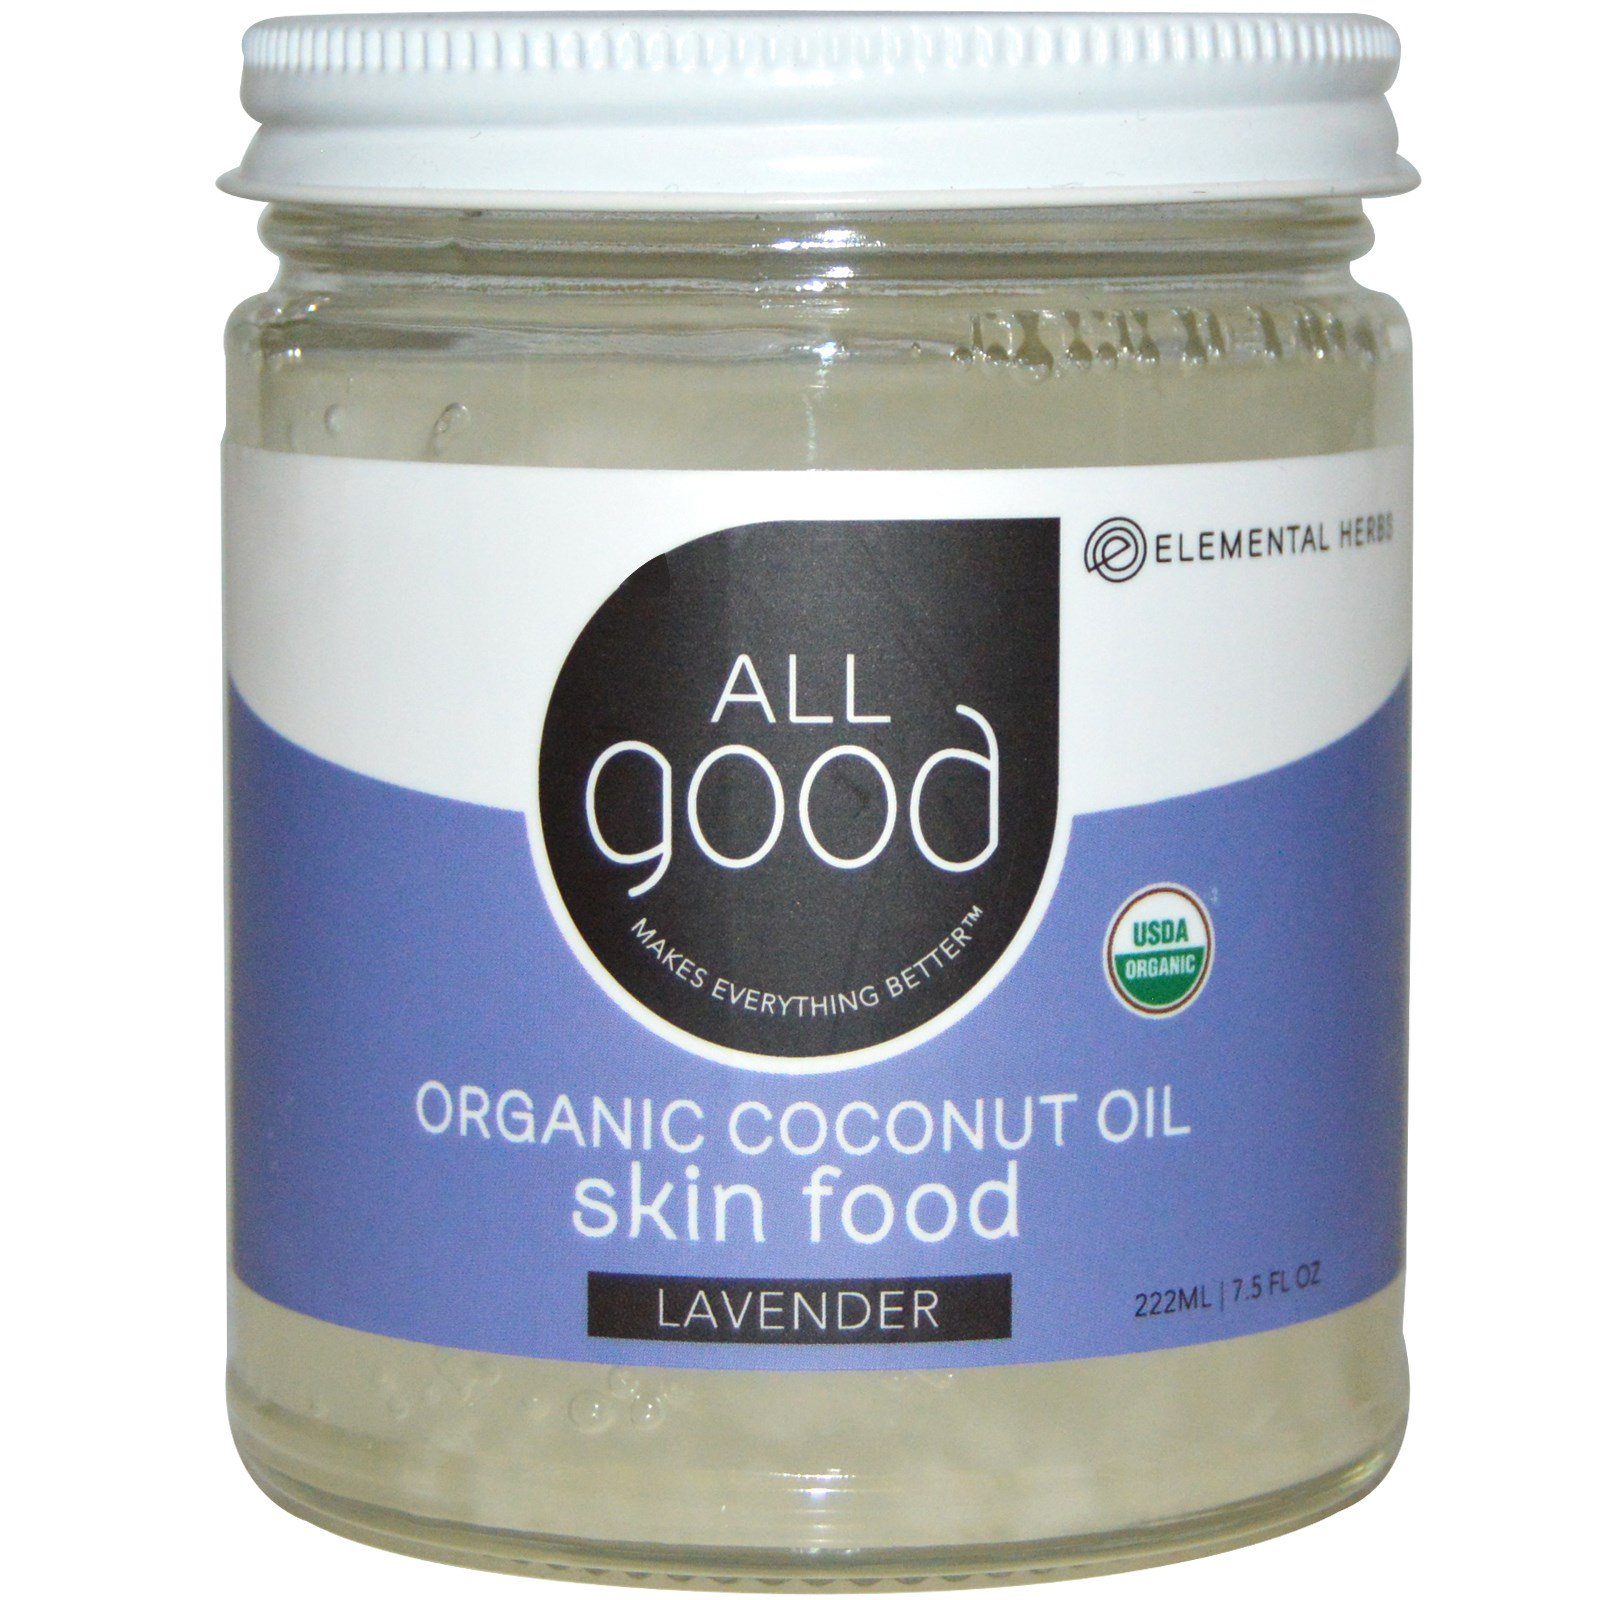 All Good Products, All Good, Органическое кокосовое масло, питание кожи, лаванда, 7.5 ж.унций (222 мл)